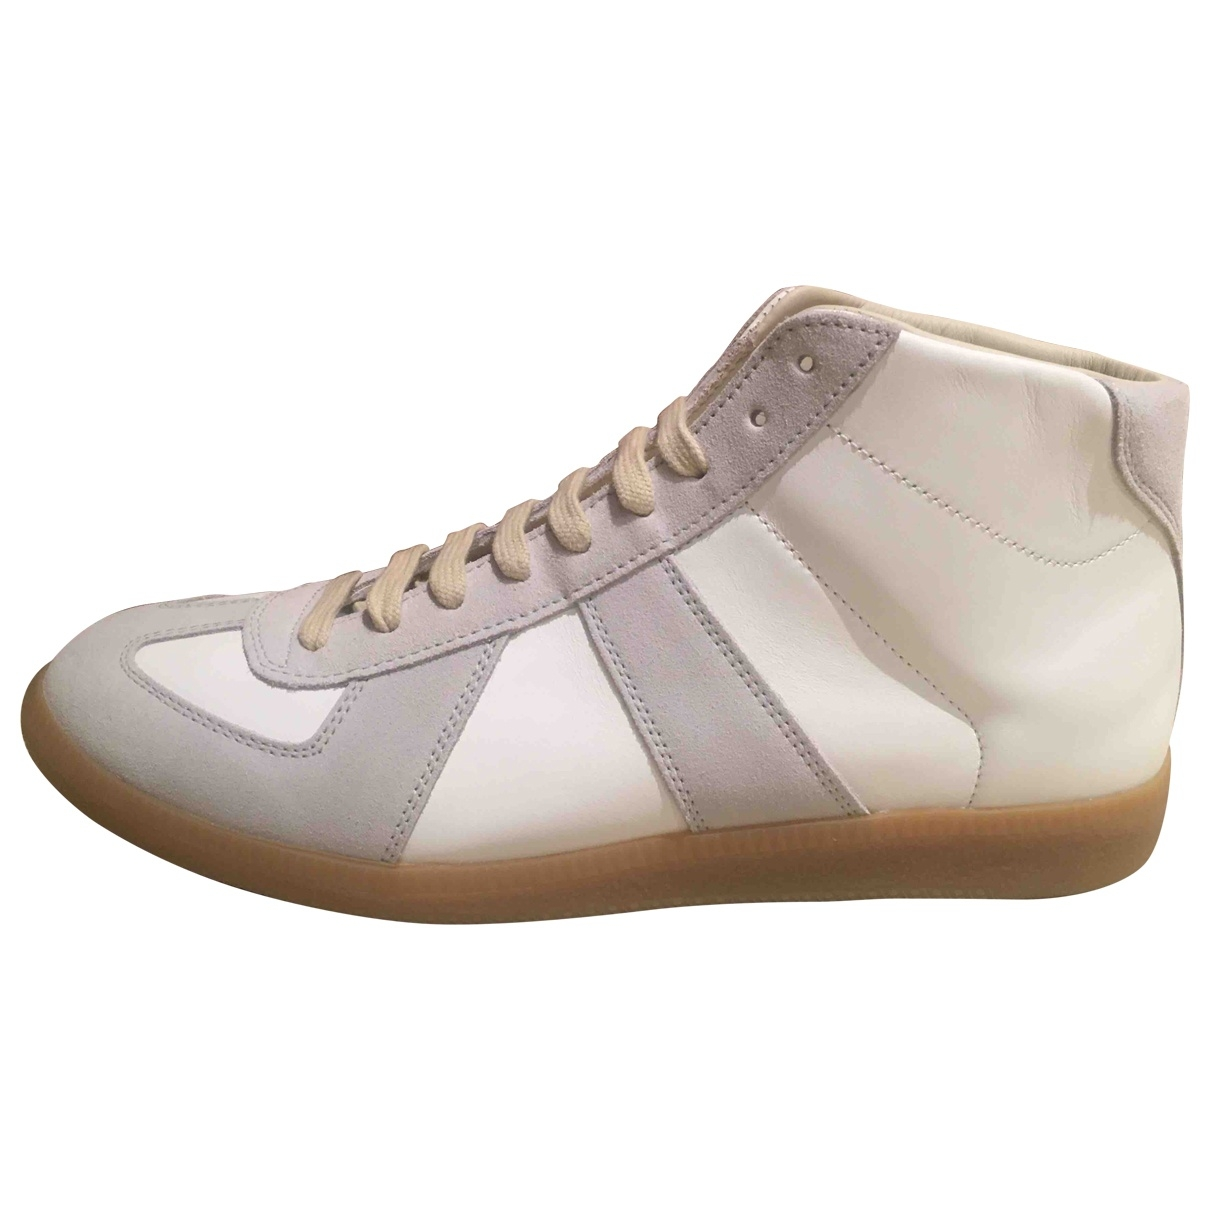 Maison Martin Margiela Replica White Leather Trainers for Men 41 EU